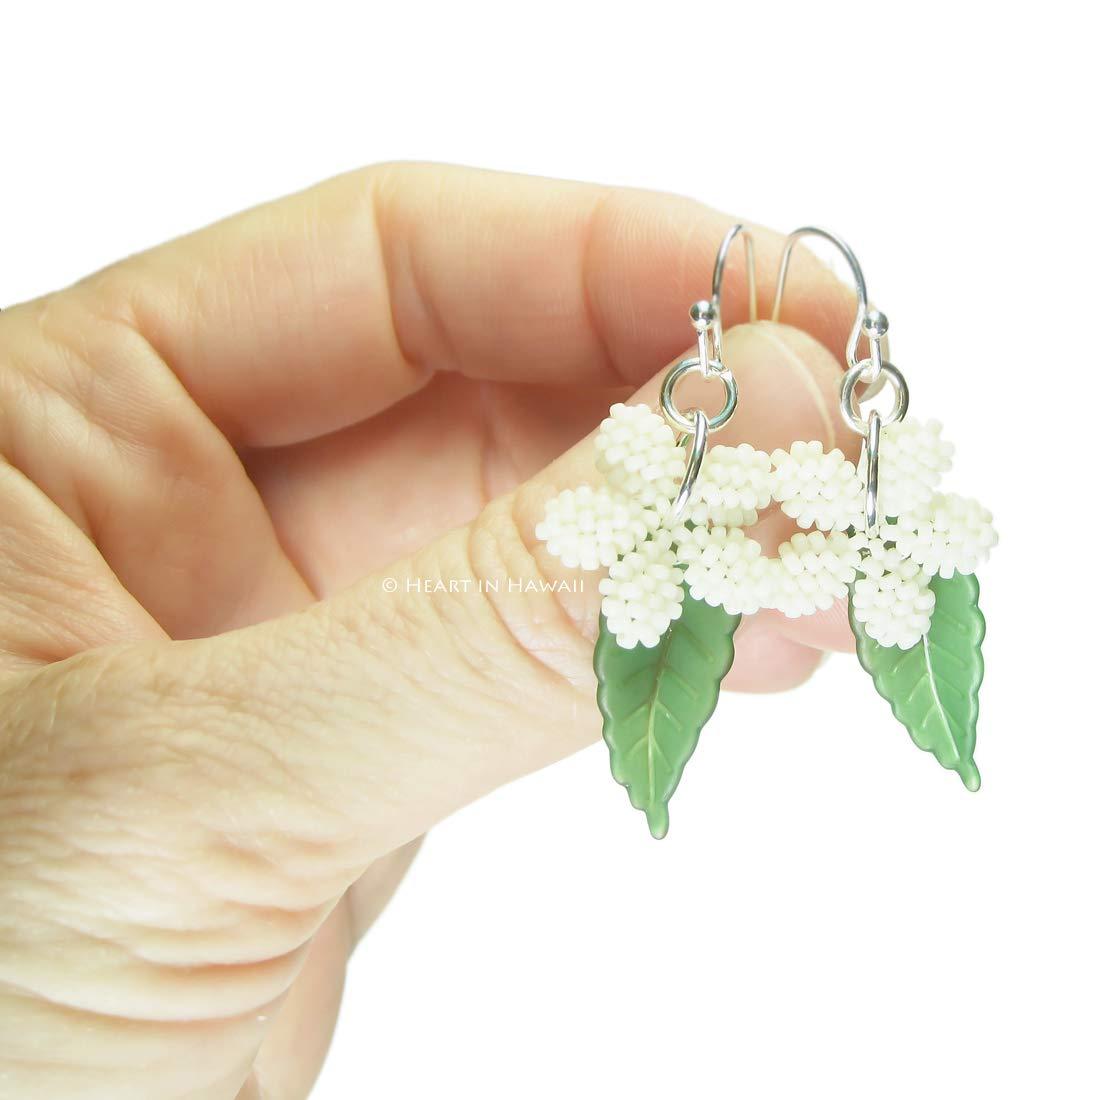 Off White Heart in Hawaii Plumeria Flower and Tropical Leaf Dangles